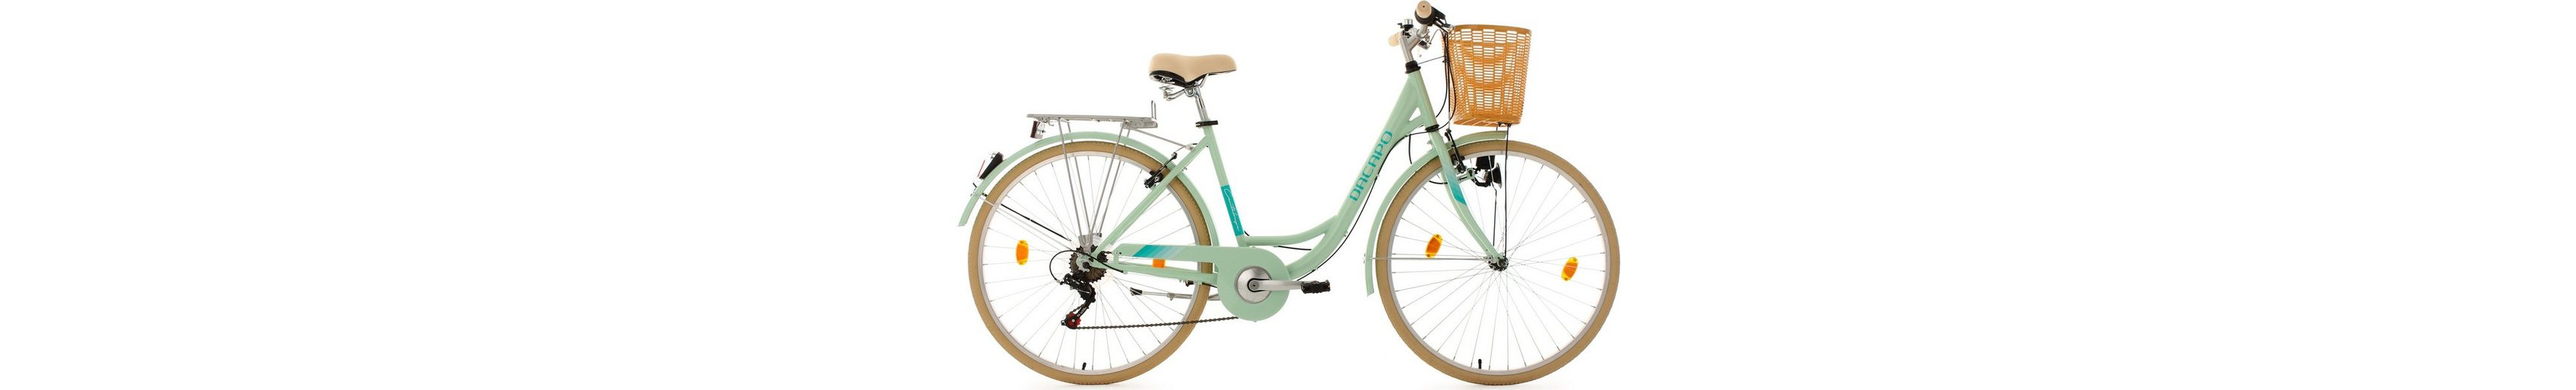 KS Cycling Damen-Cityrad, 28 Zoll, mint, Shimano 6 Gang-Kettenschaltung, »Cantaloupe«